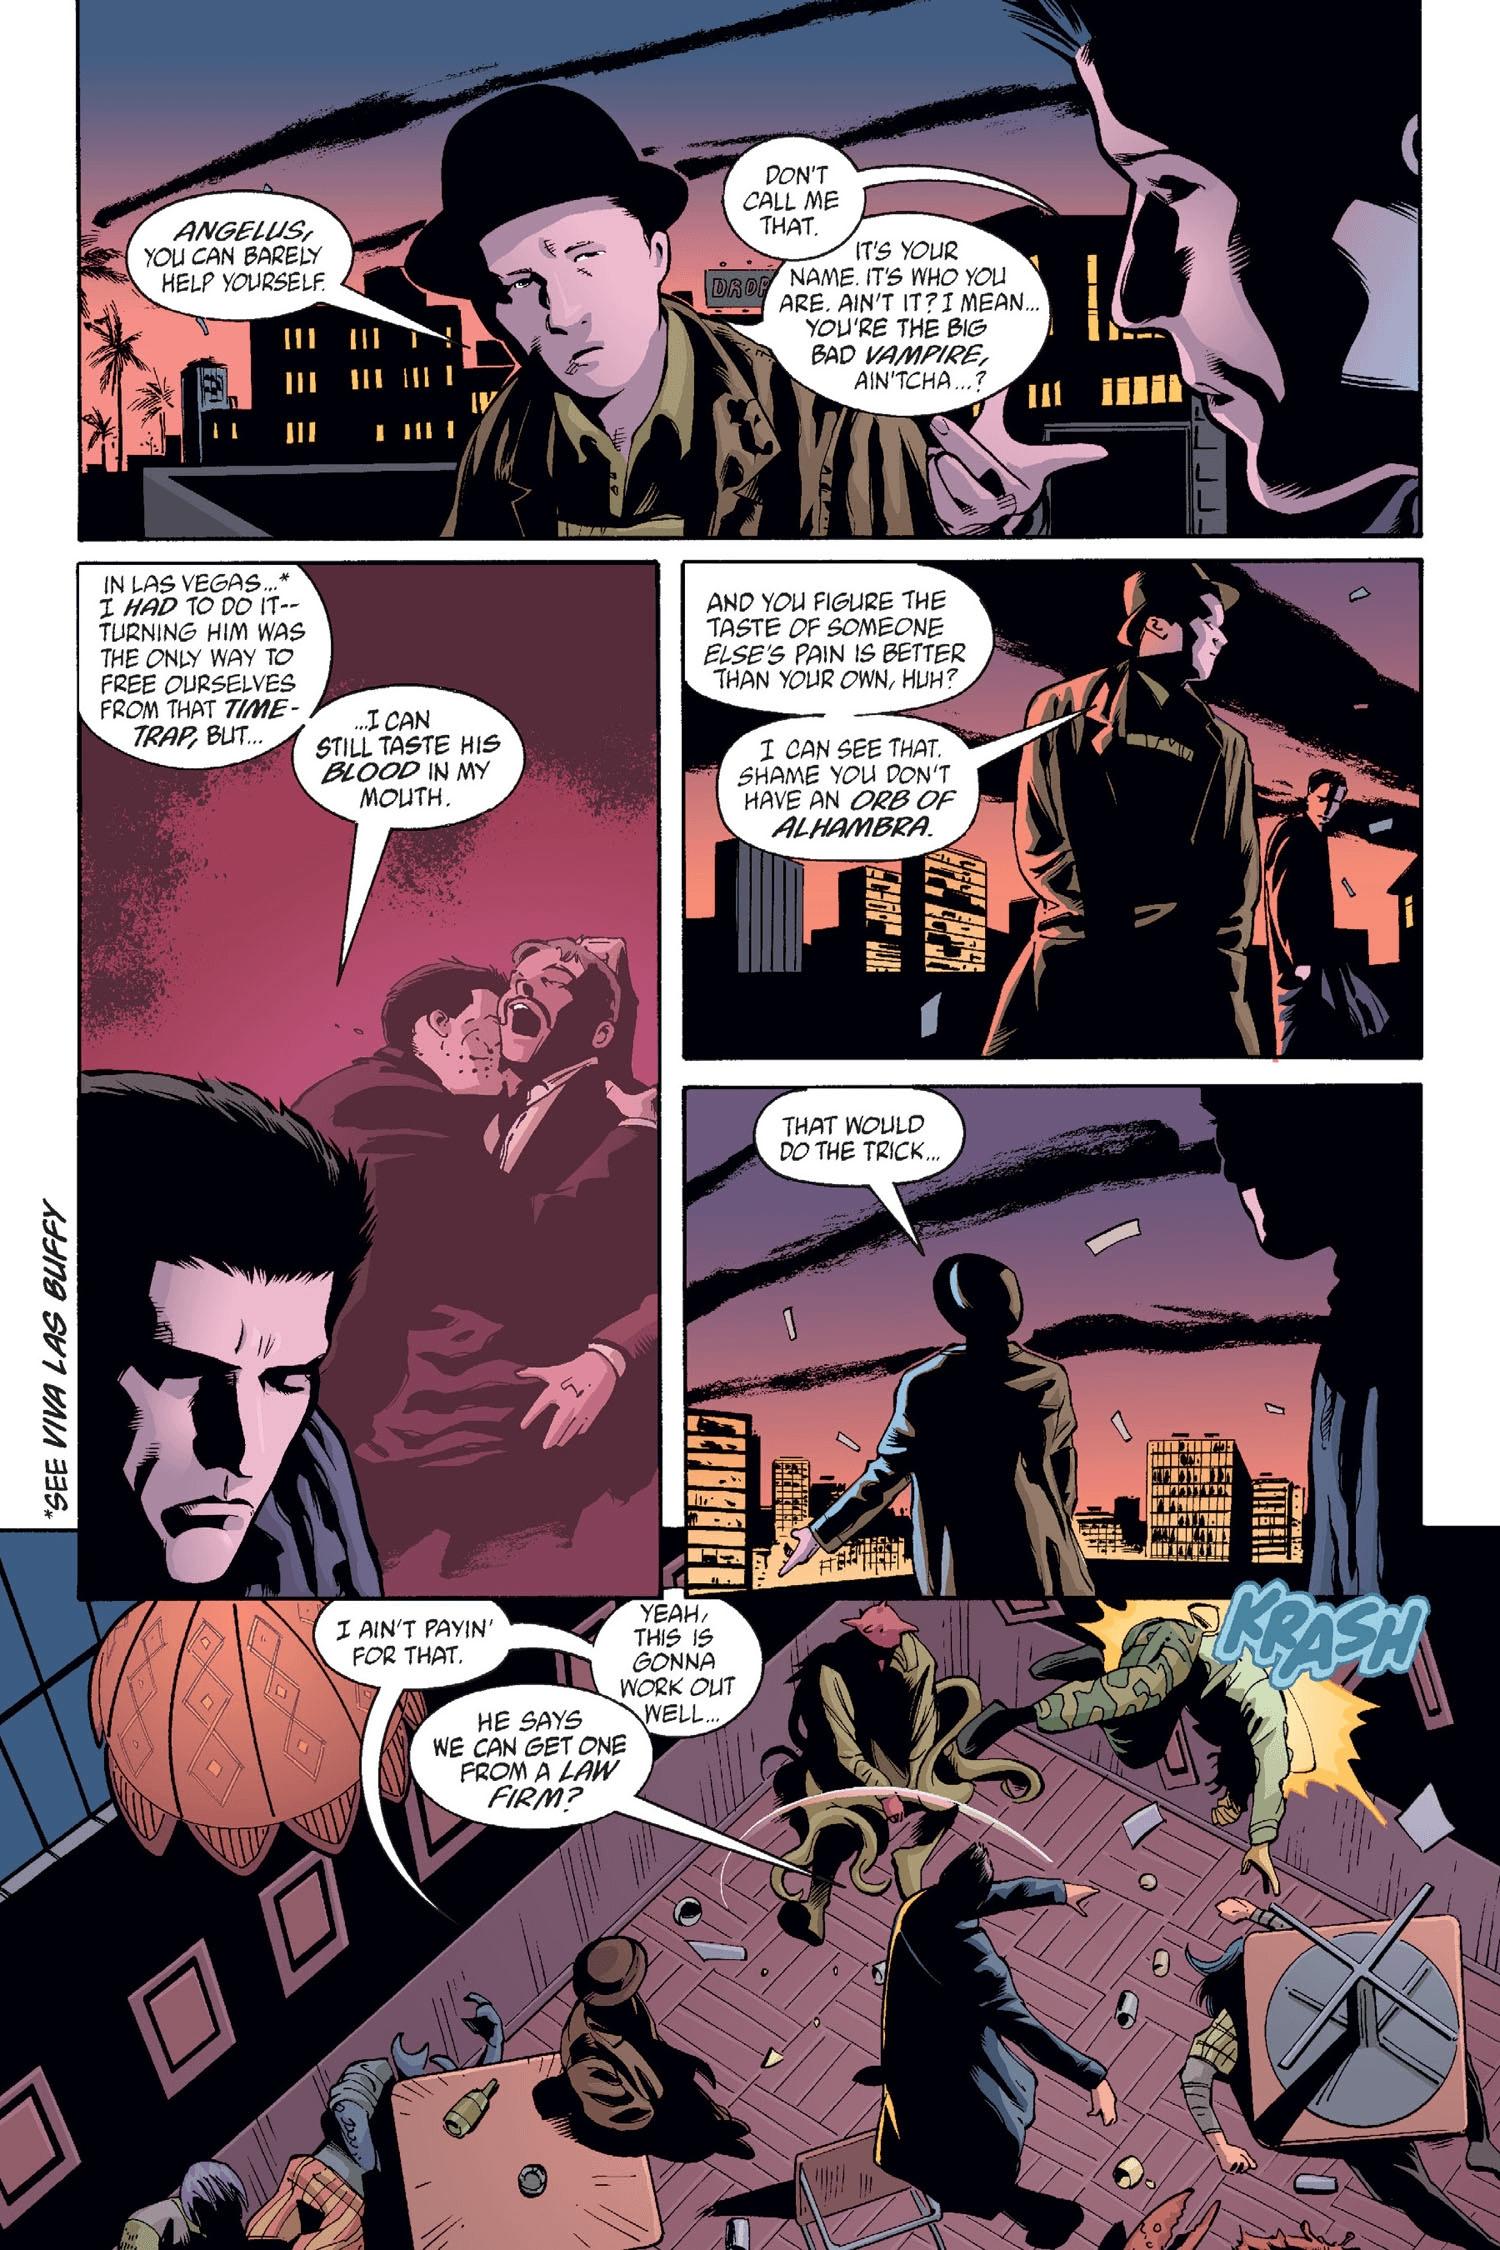 Read online Buffy the Vampire Slayer: Omnibus comic -  Issue # TPB 2 - 25